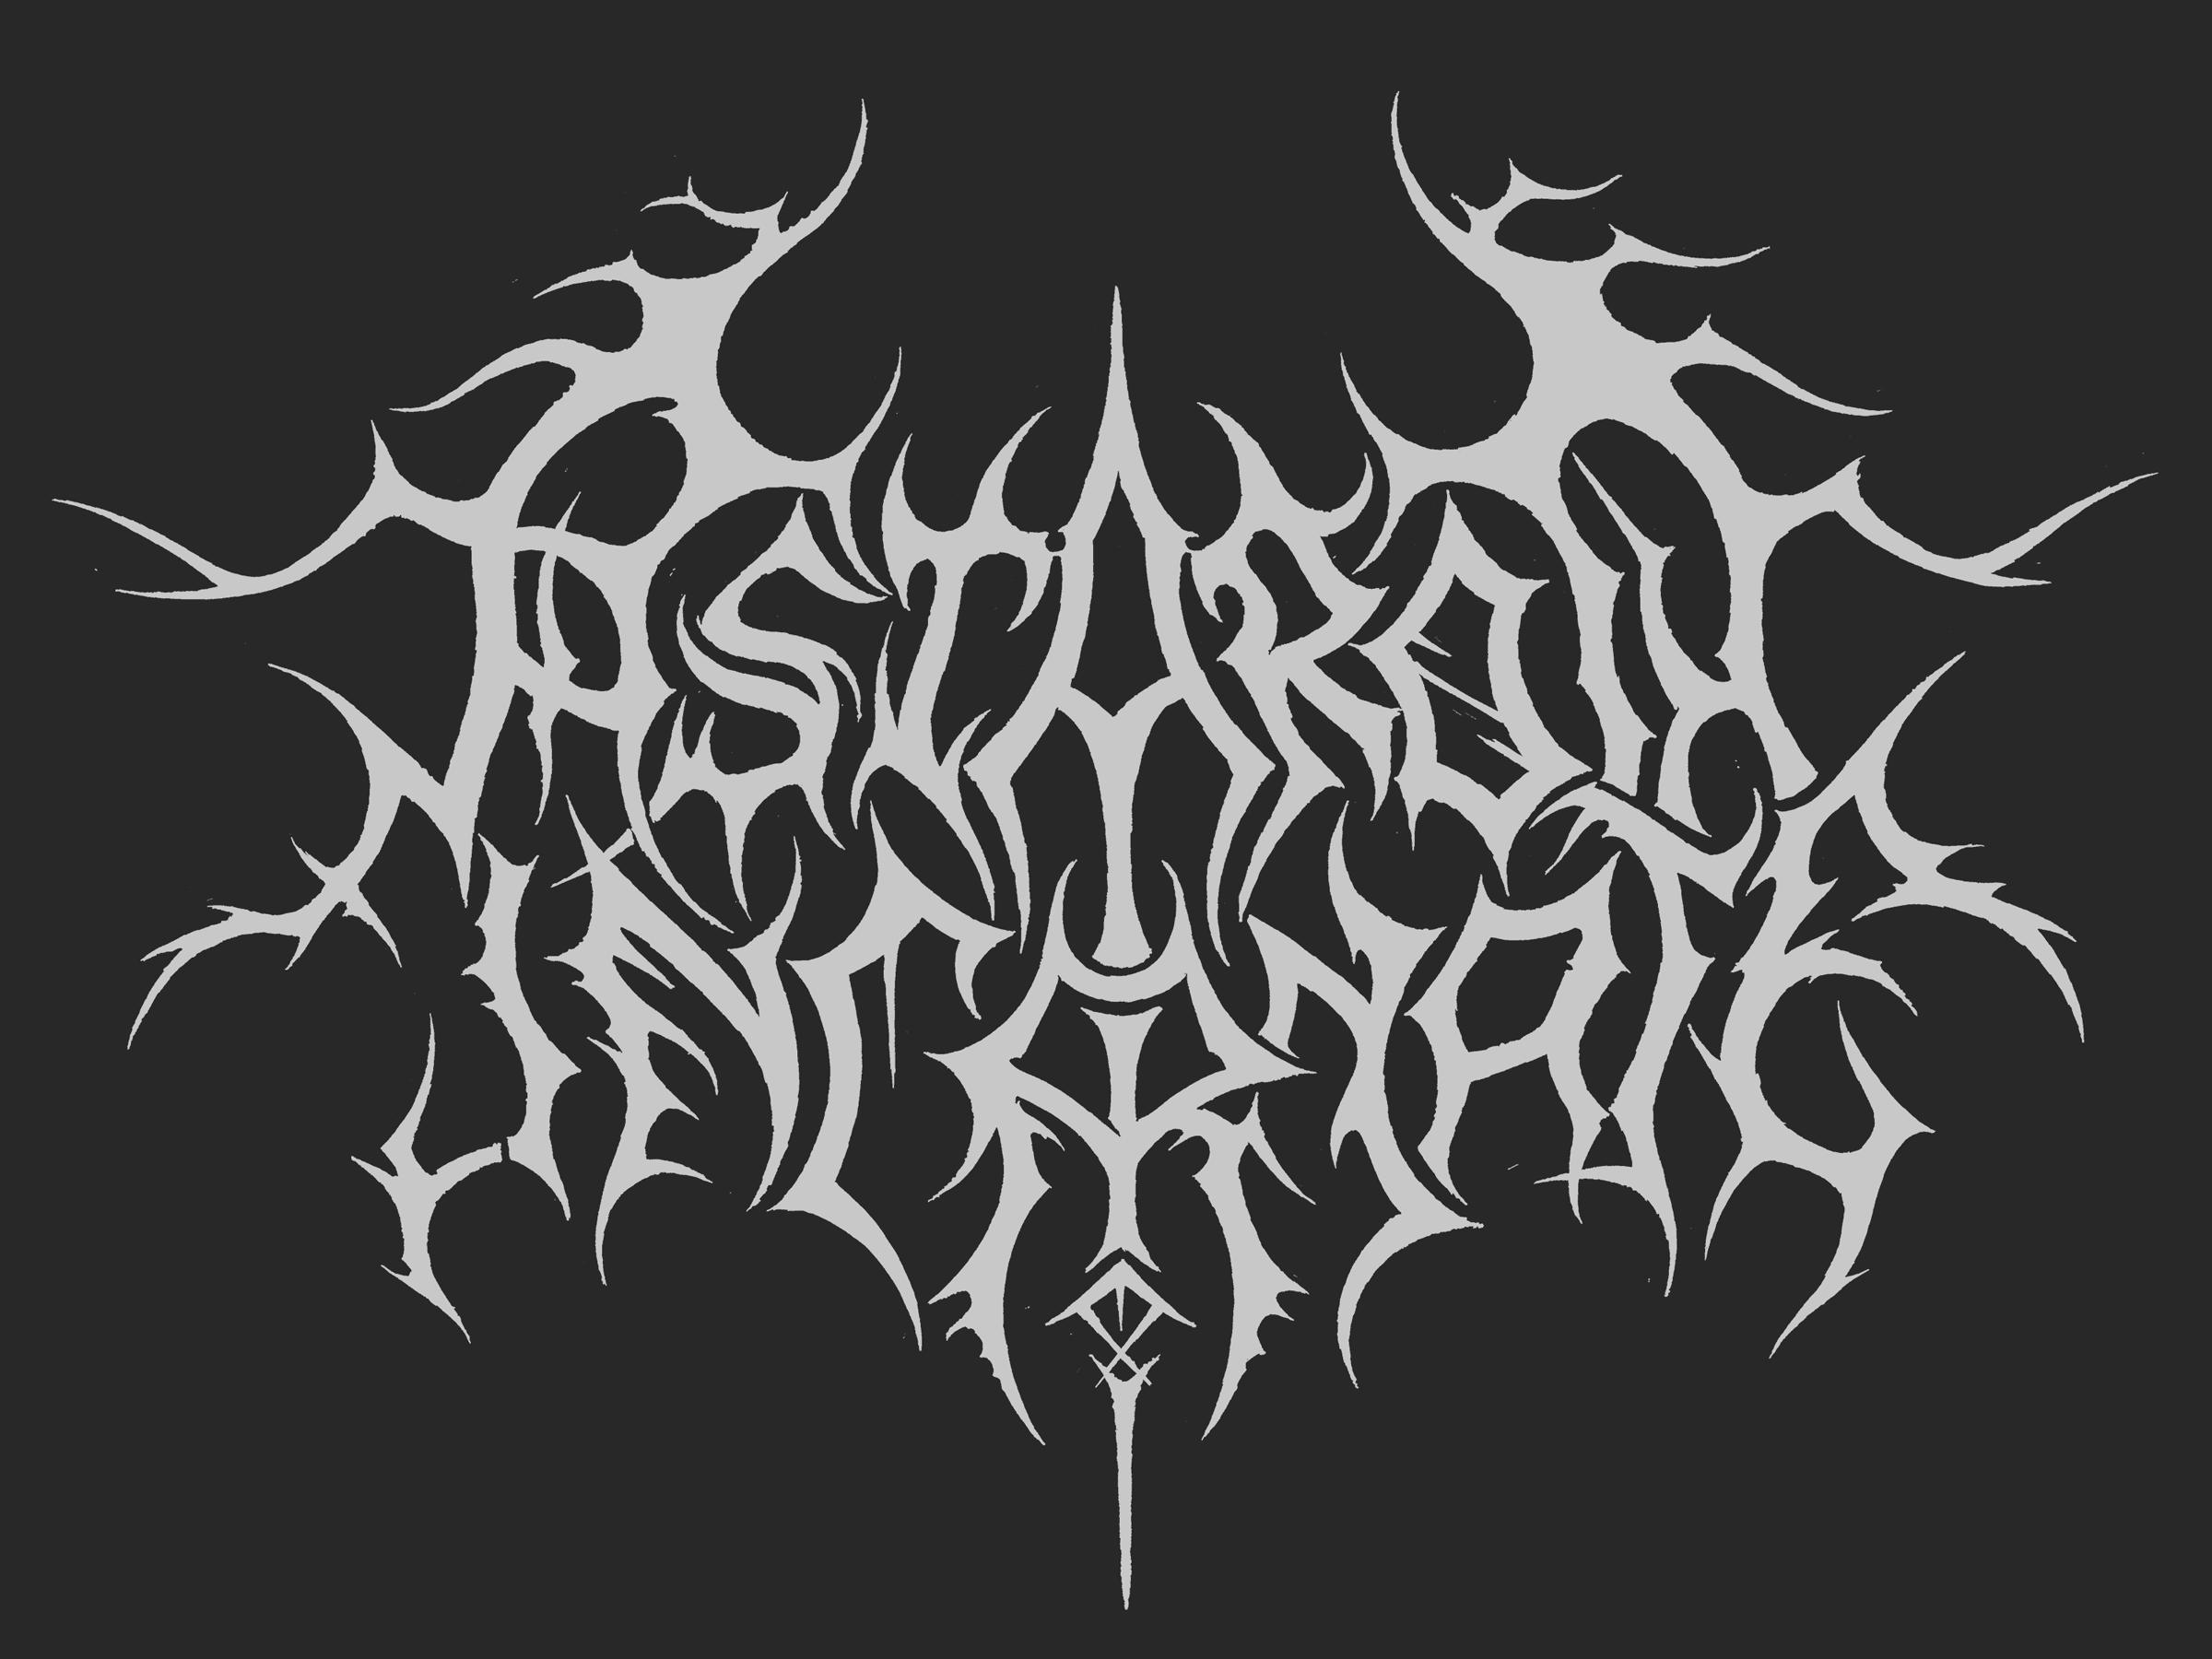 Astaroth Incarnate band logo